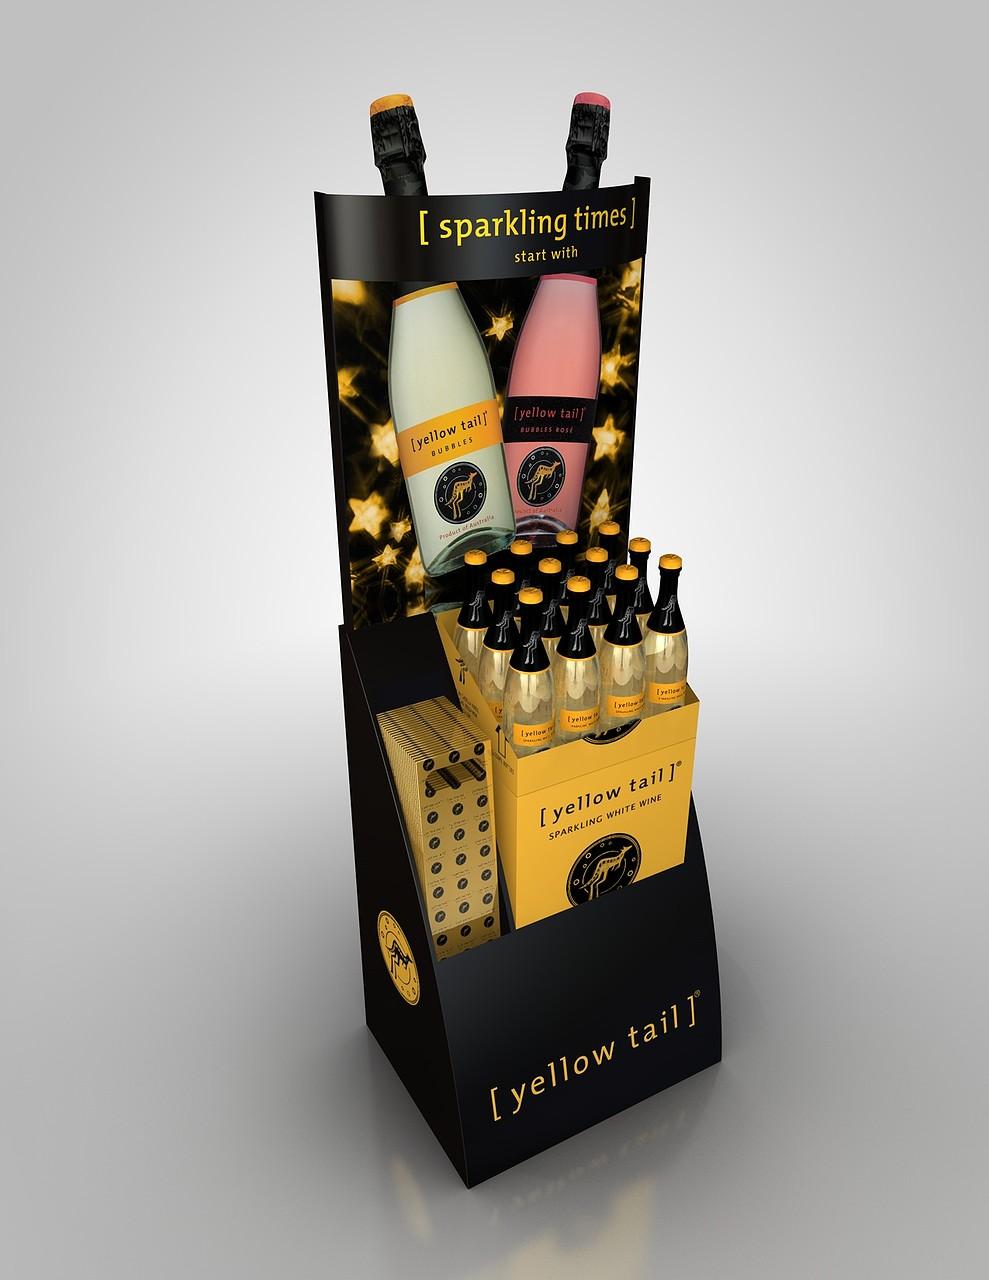 Yellowtail sparkling 2010 B2.jpg